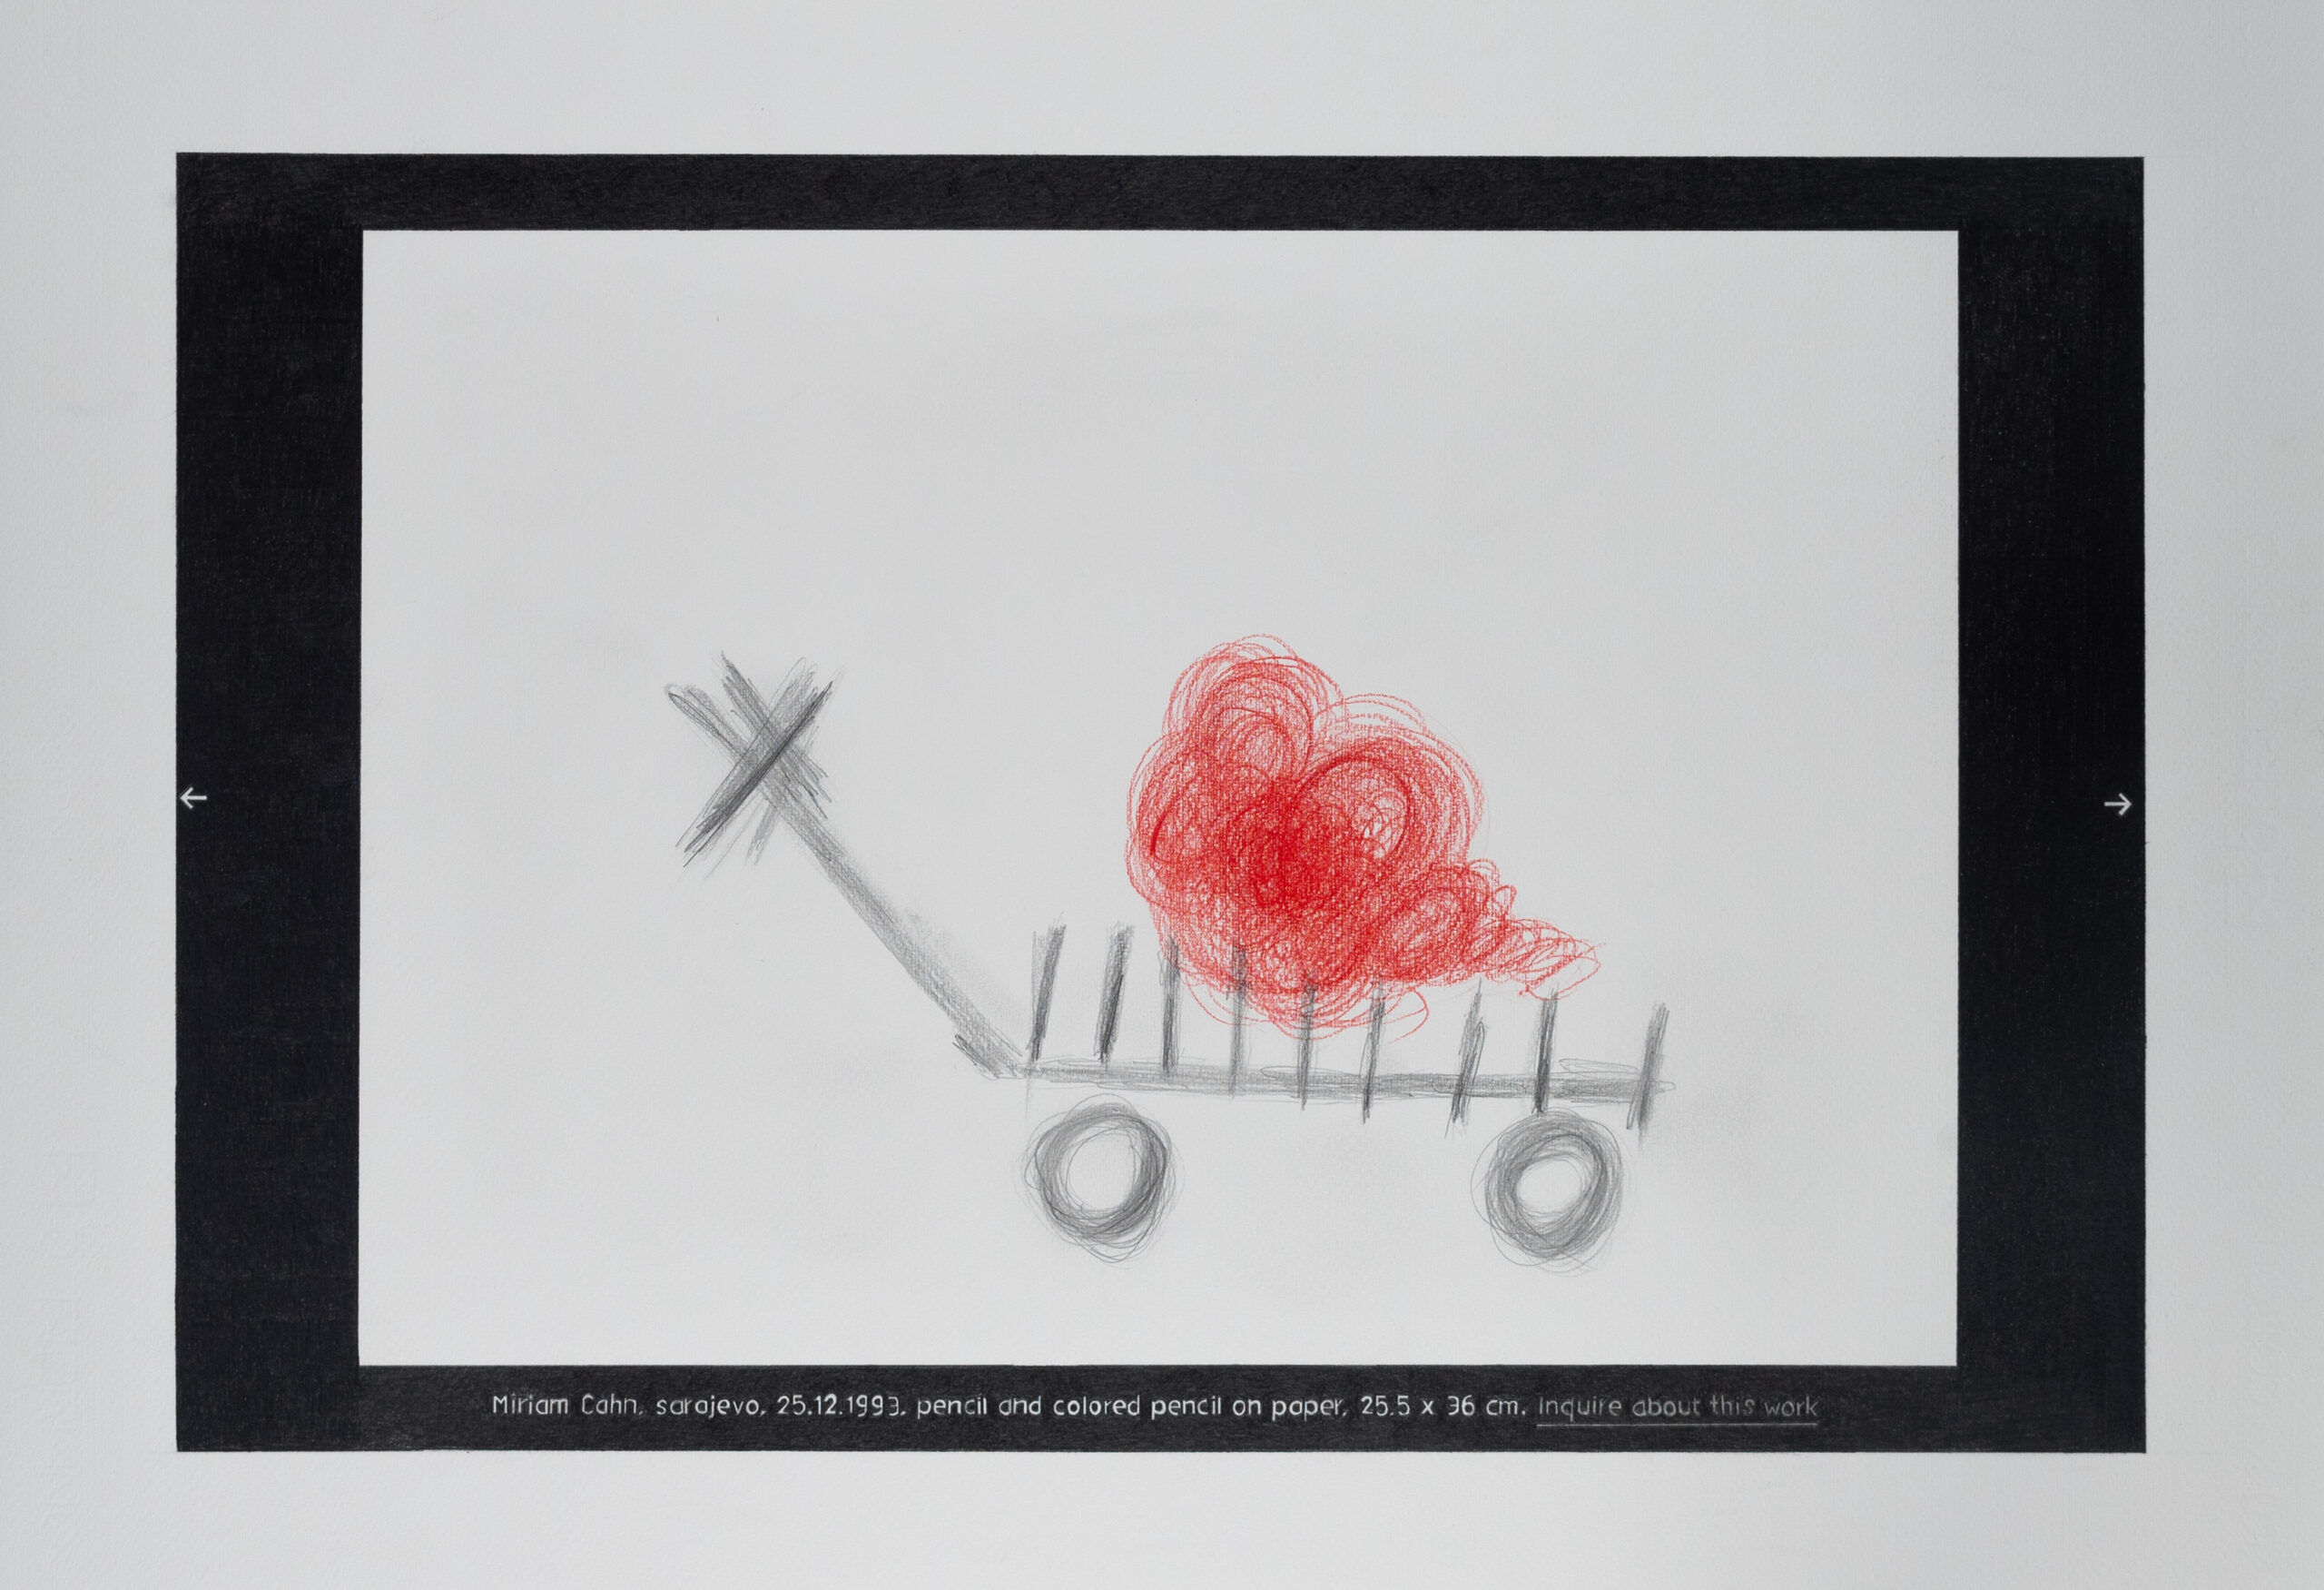 CAPTURA (MIRIAM CAHN 1) 50 X 70'5 cm.Grafito y lápiz rojo sobre papel.2020